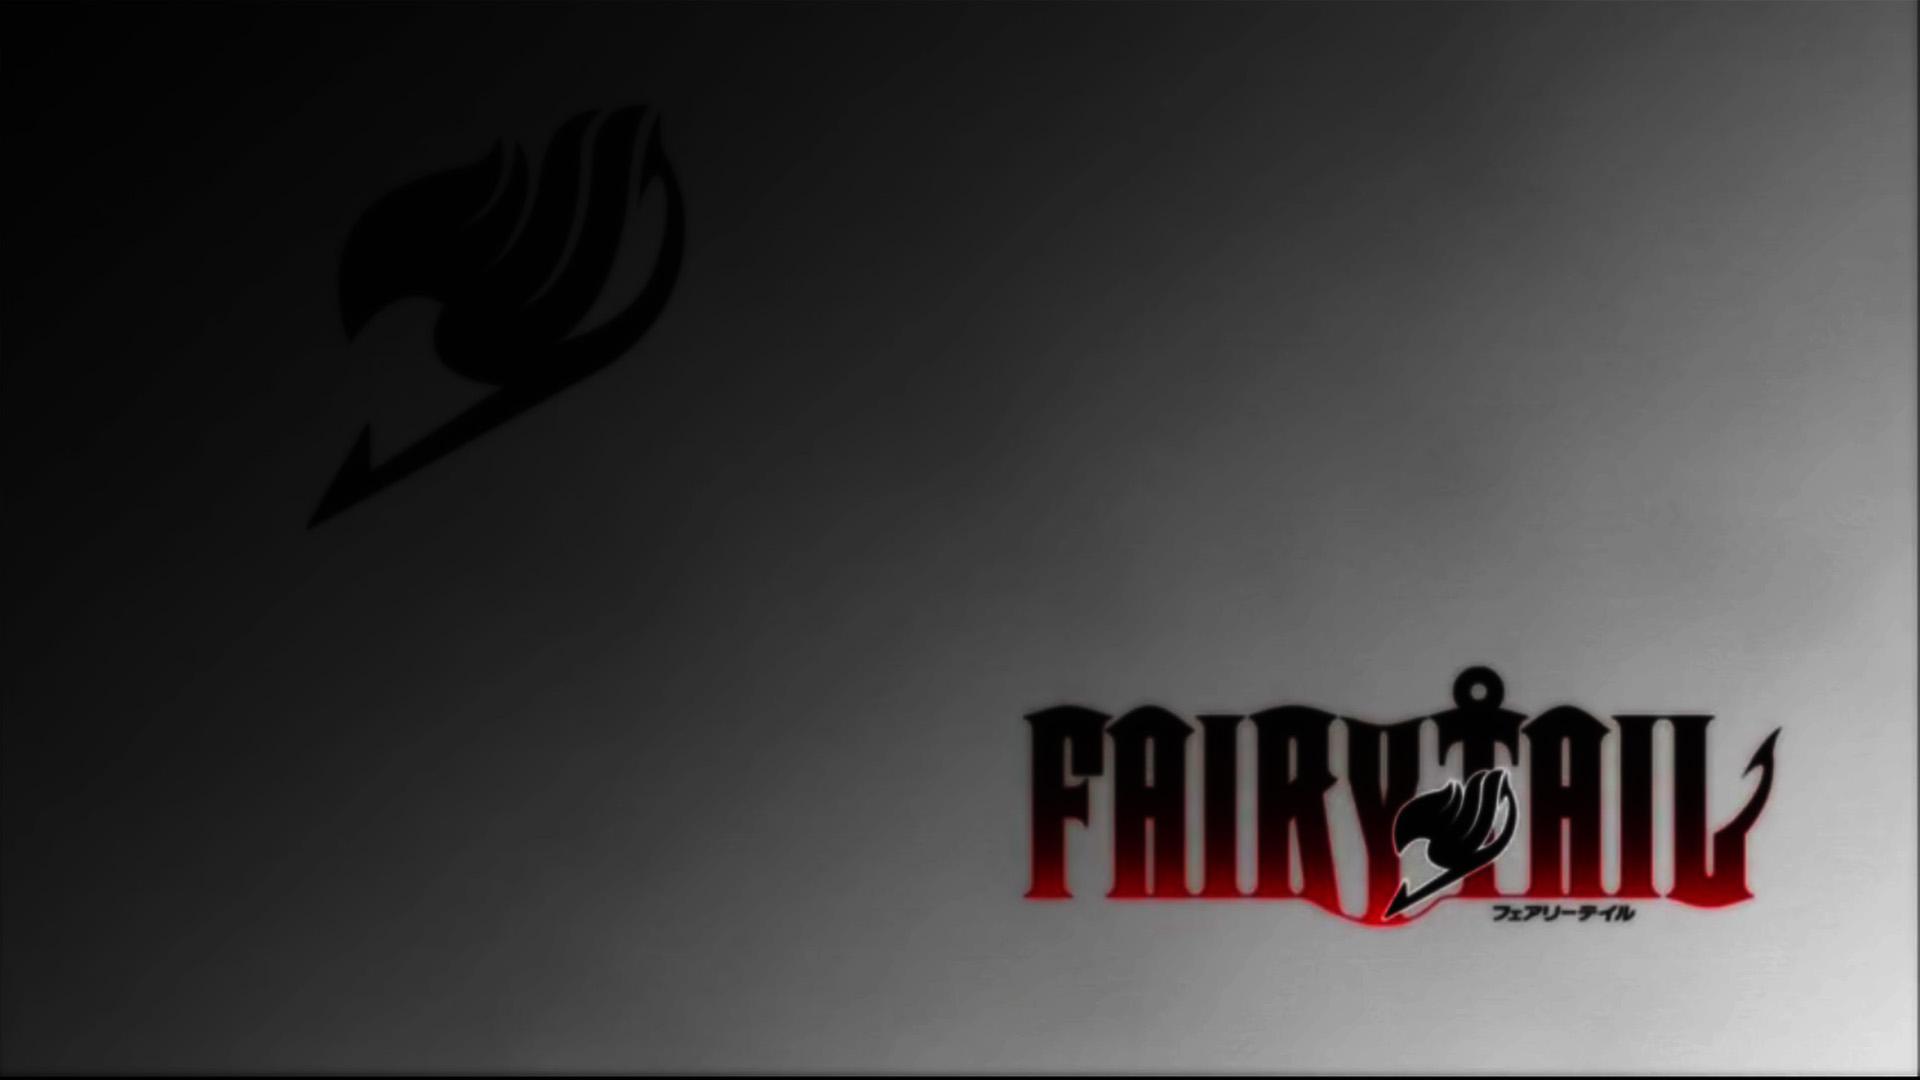 fairy tail logo wallpaper HD 1920x1080